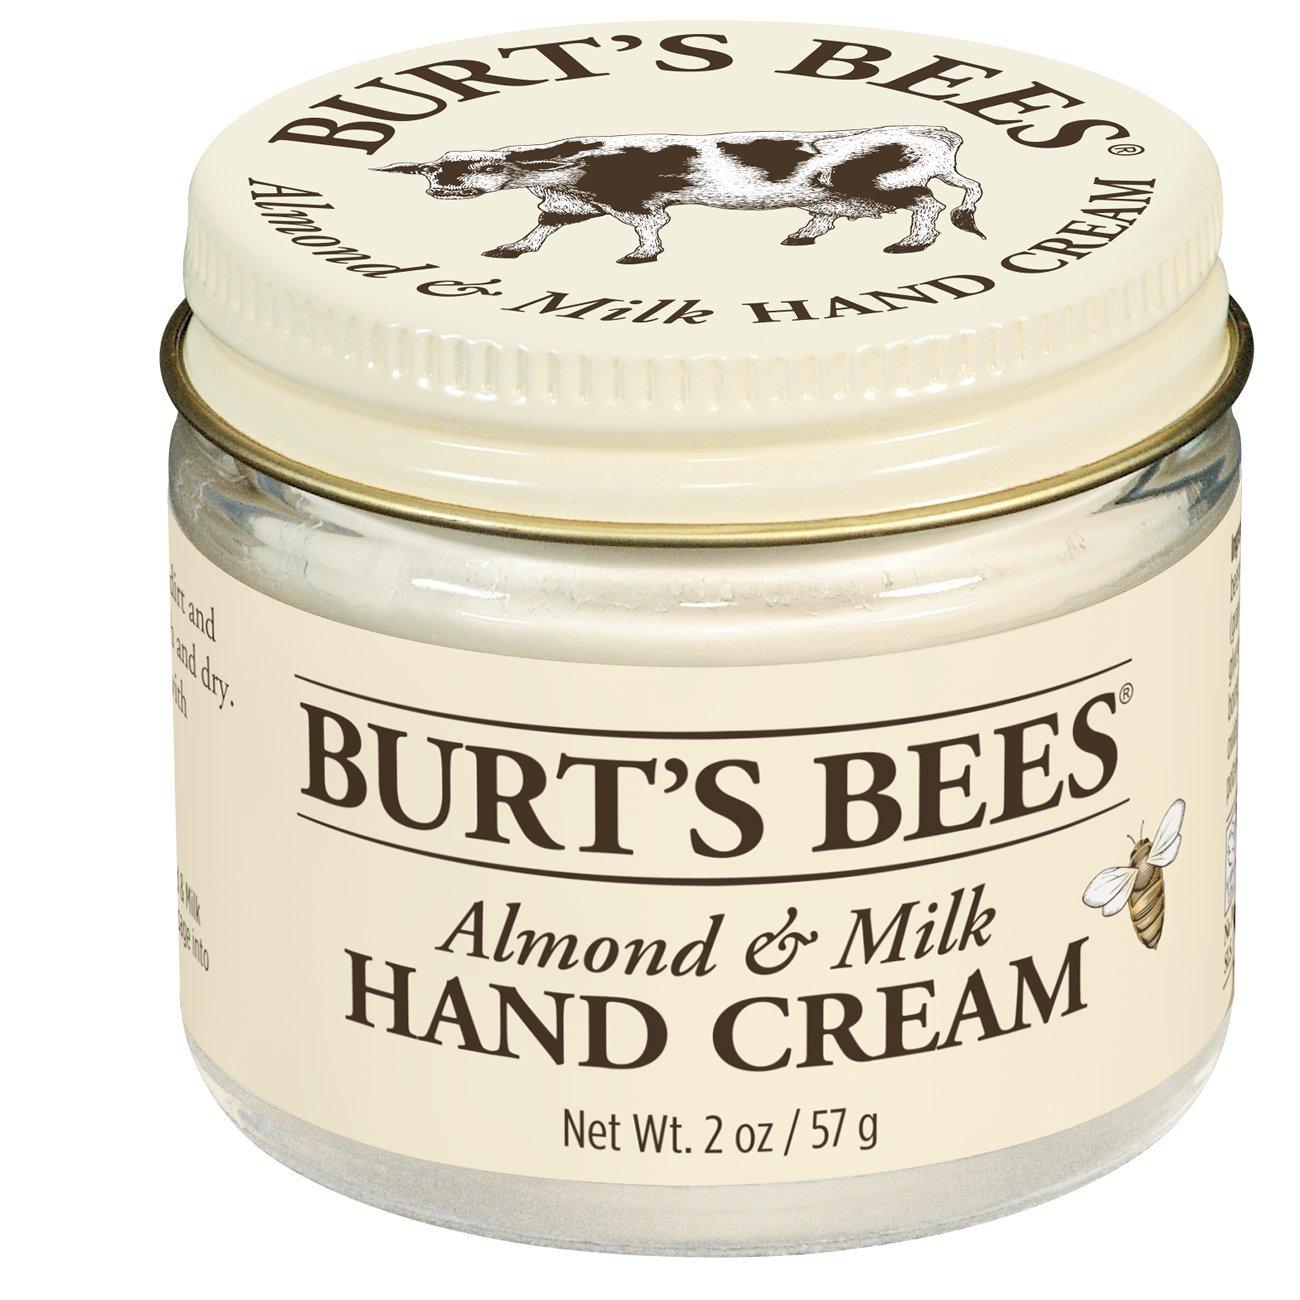 Burt's Bees Almond & Milk Hand Cream - 2 Ounce Jar (Pack of 2)